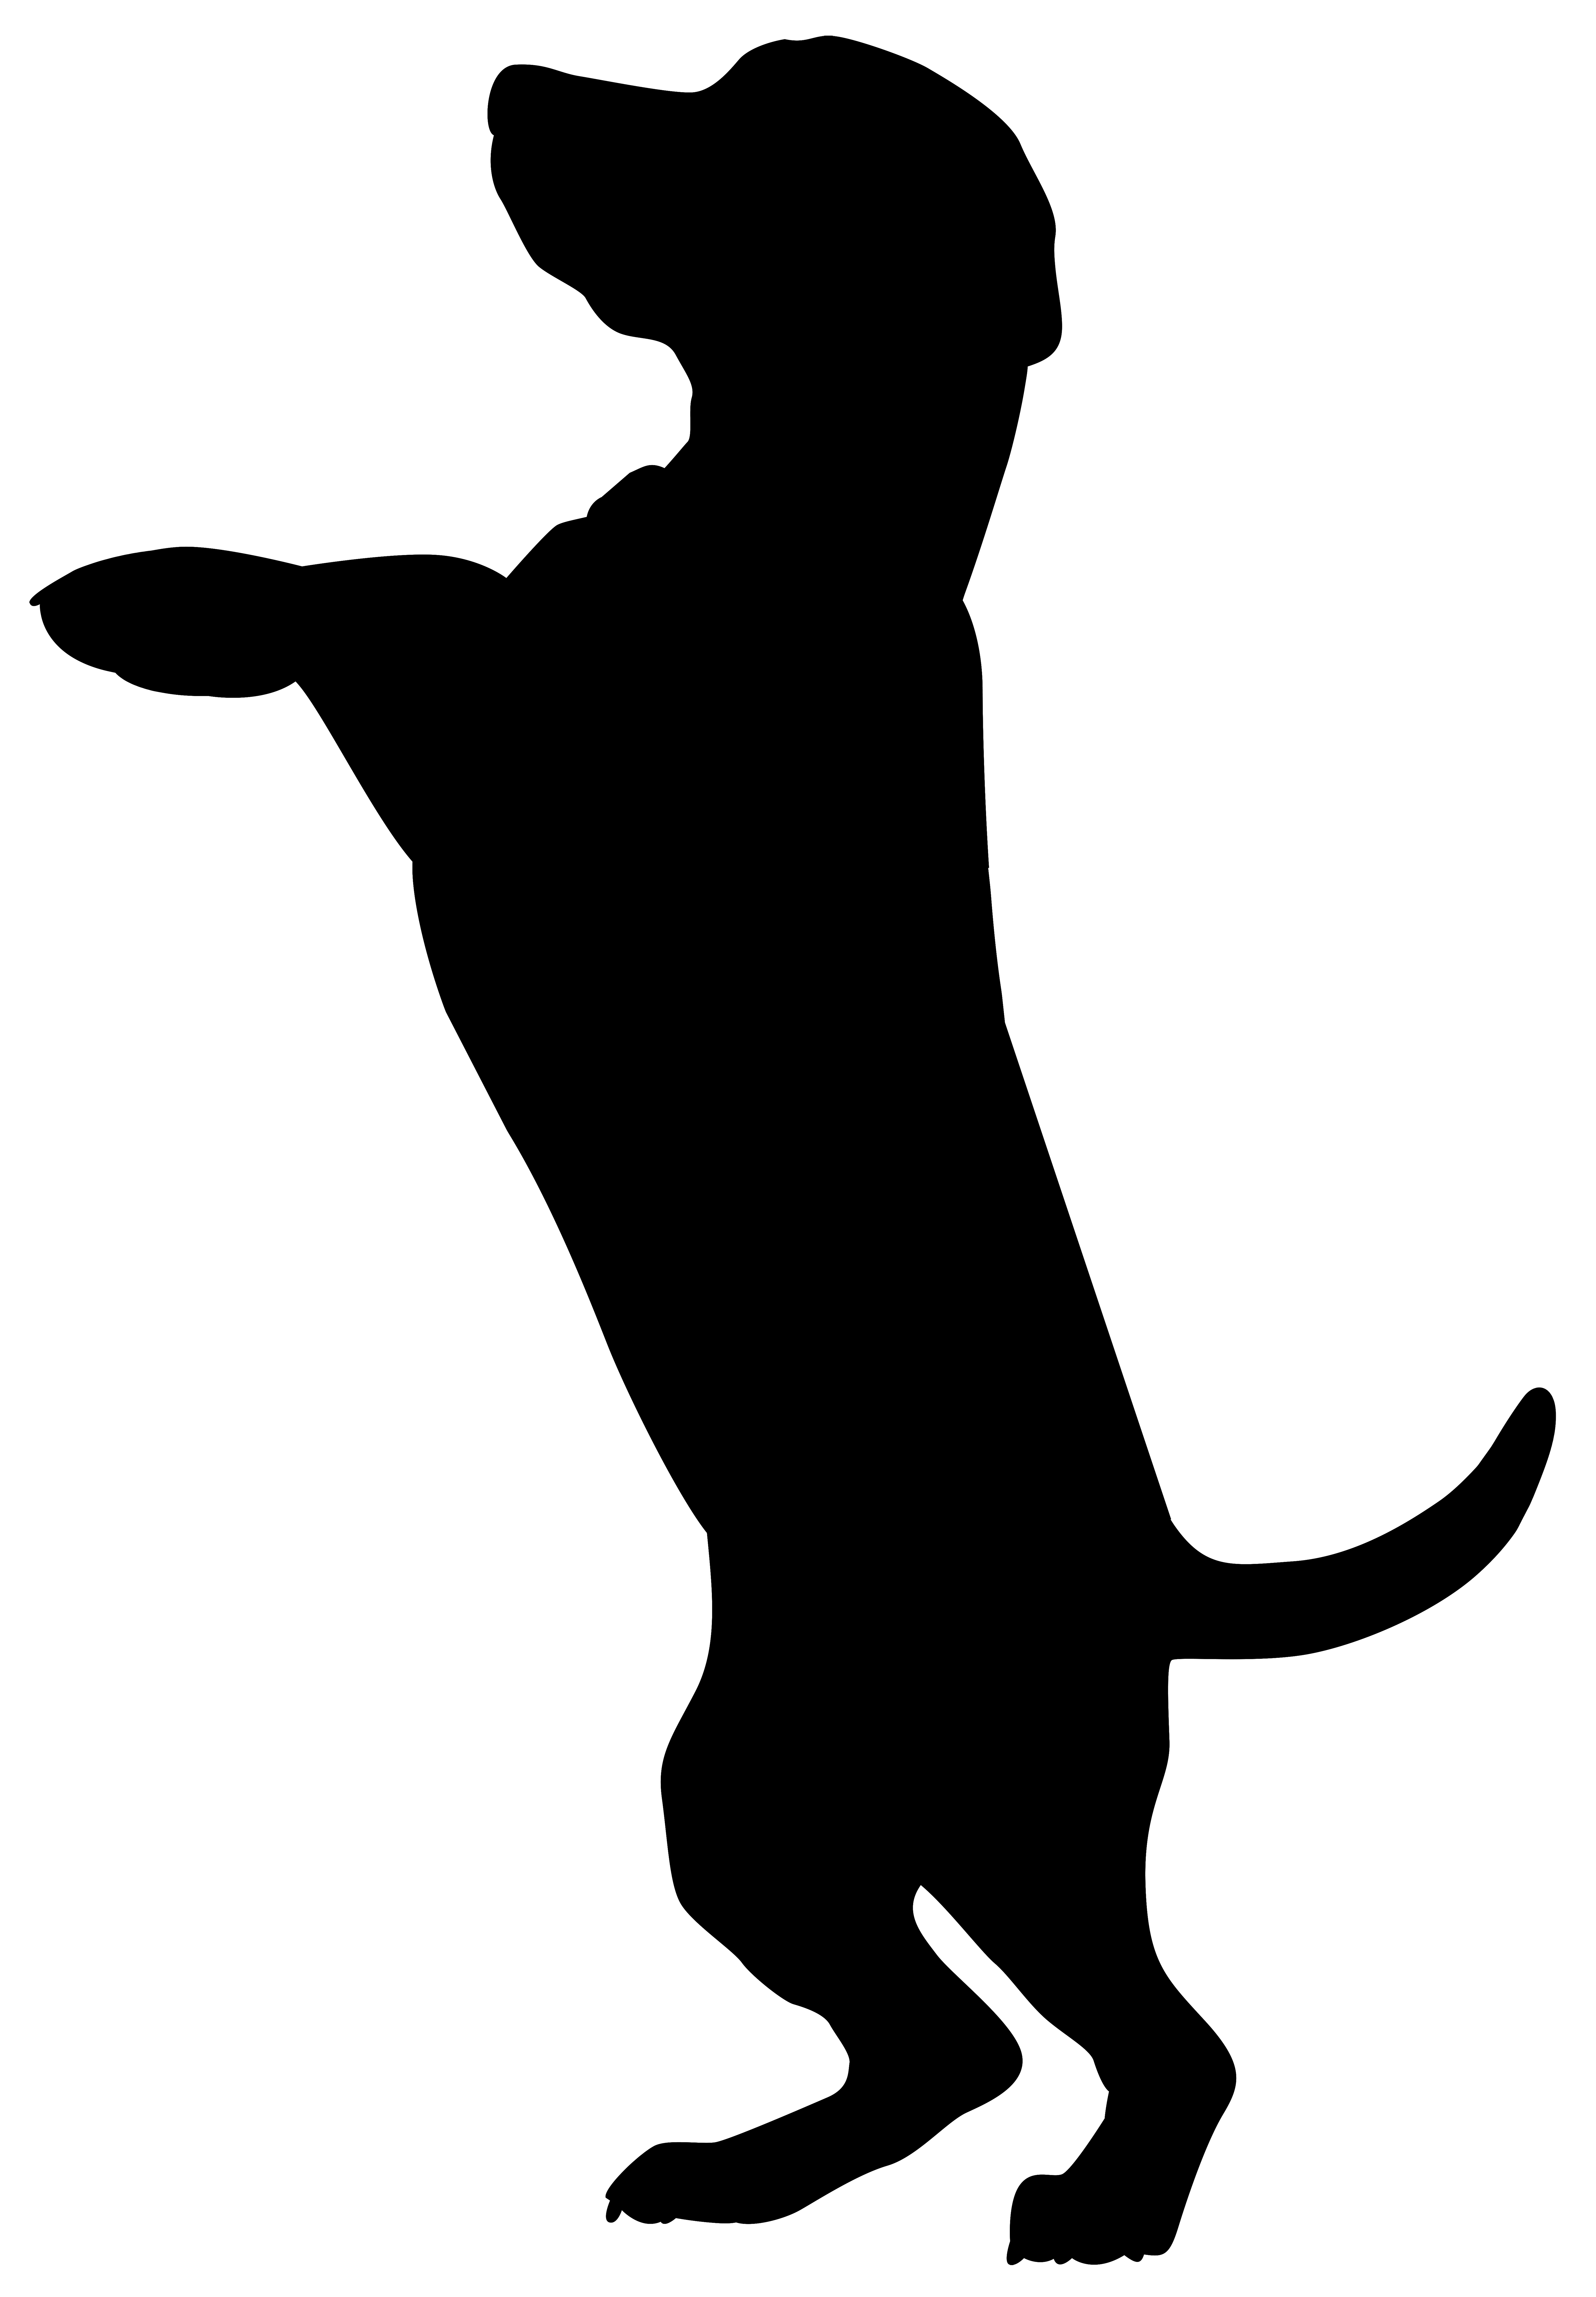 Boxer dobermann cat pet. Paw clipart silhouette dog